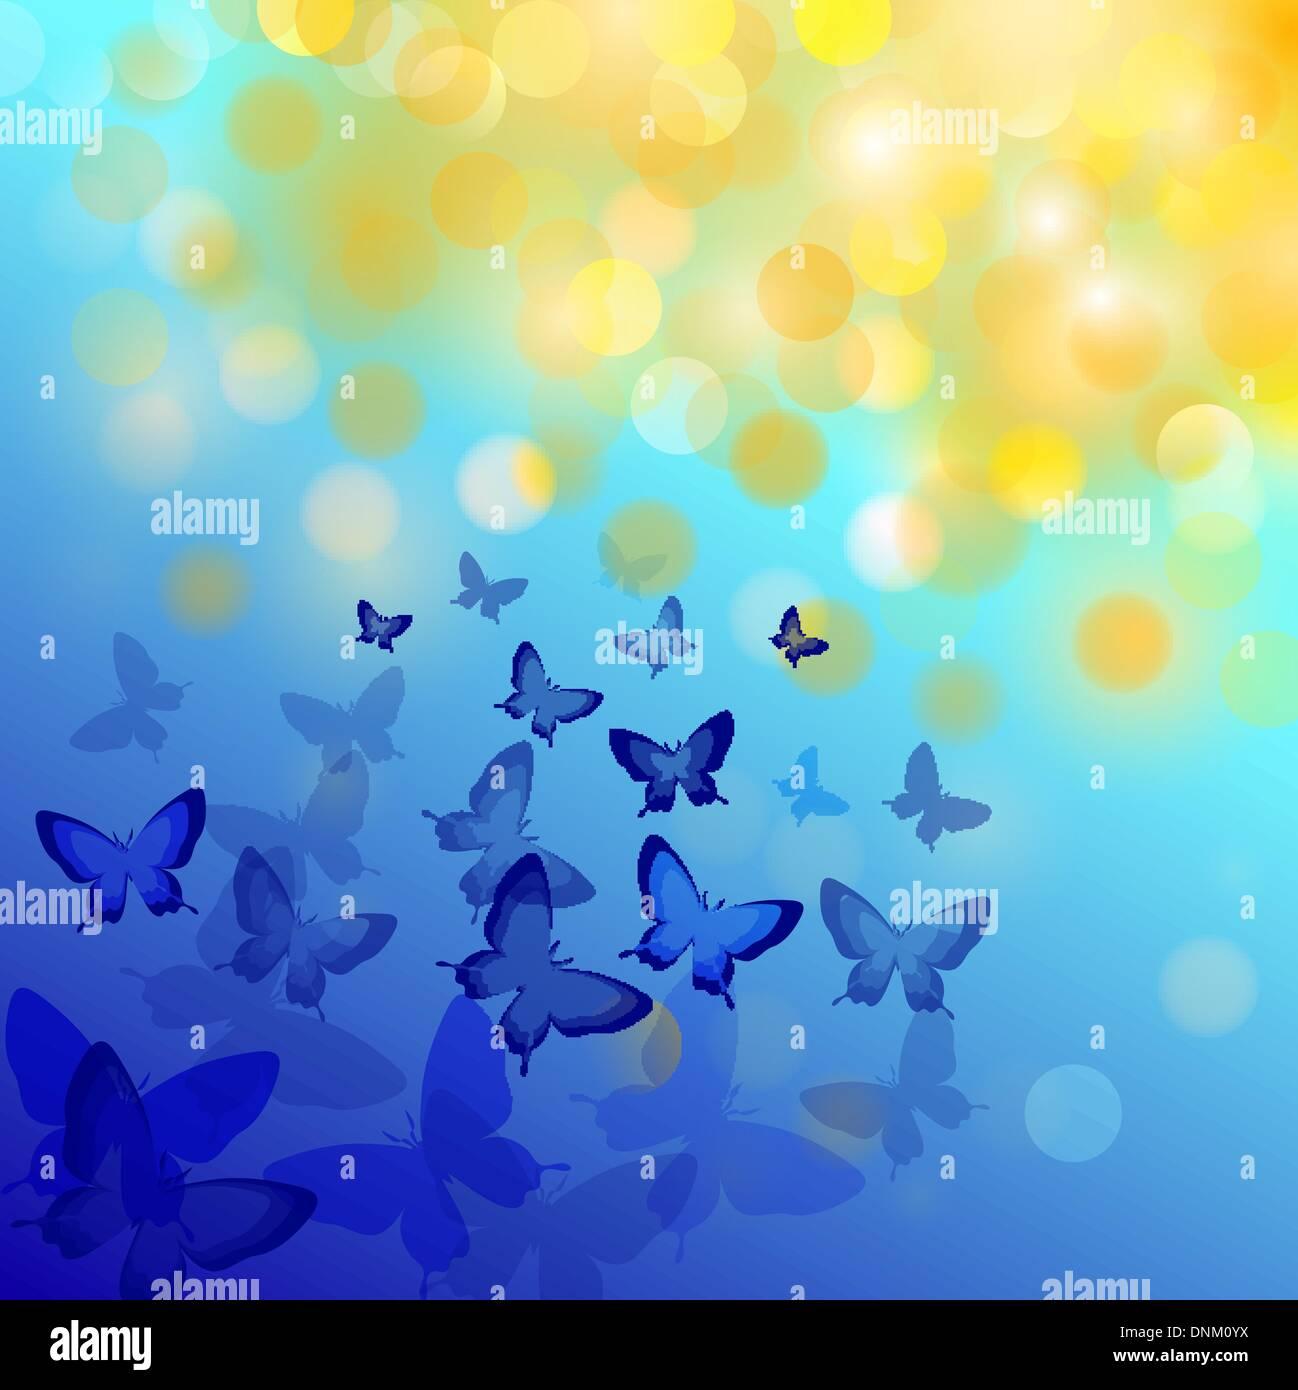 Resumen de antecedentes coloridos con mariposas. Un vector. Imagen De Stock